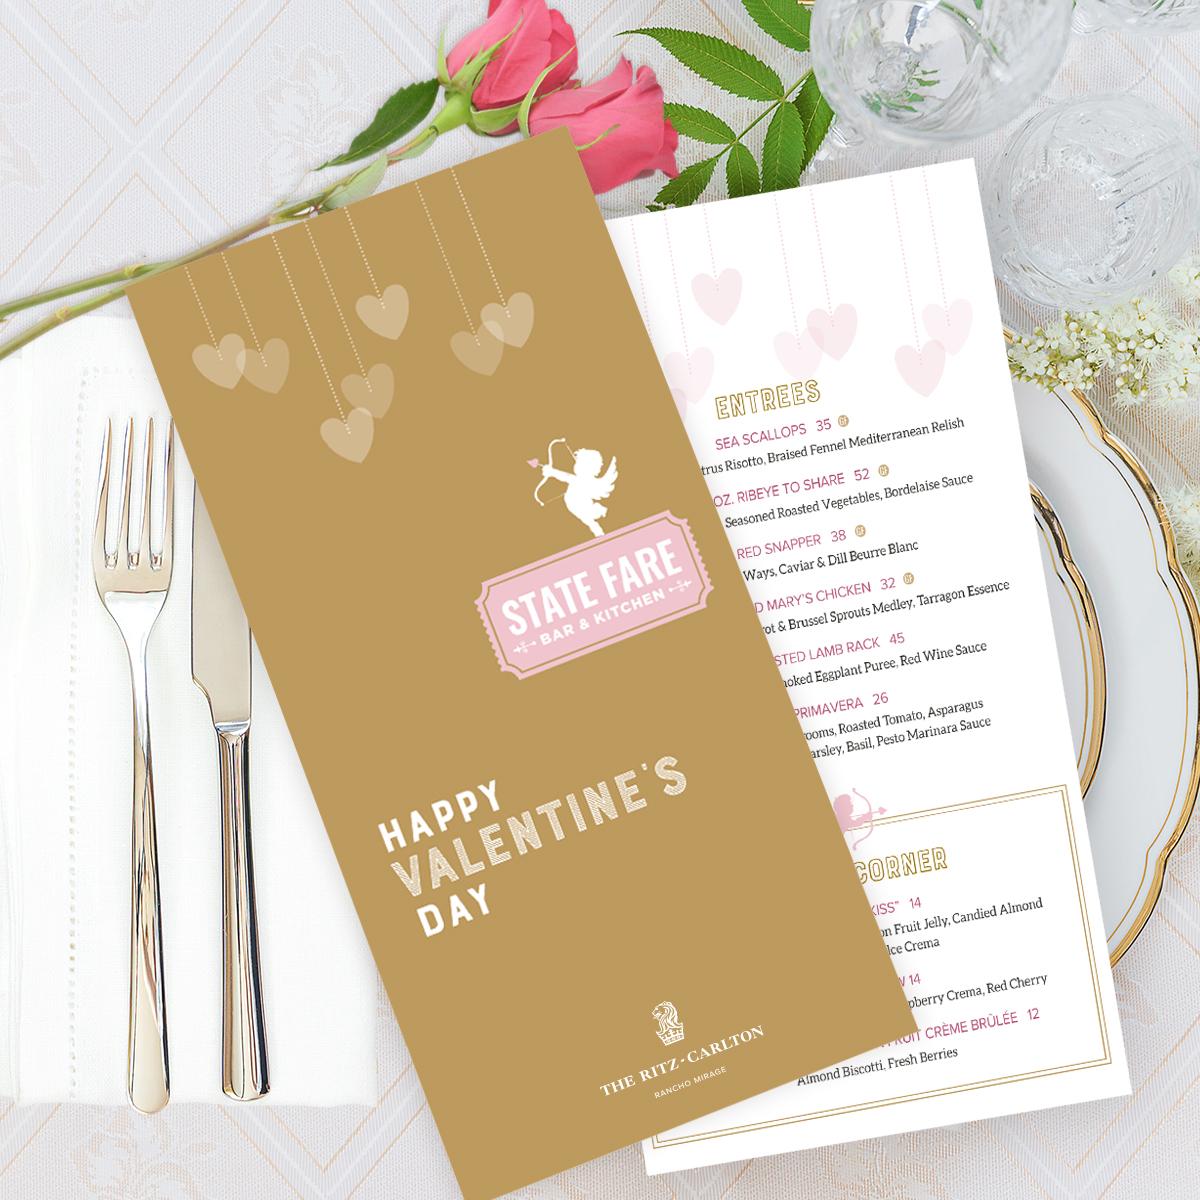 2018 Valentines Menu Design